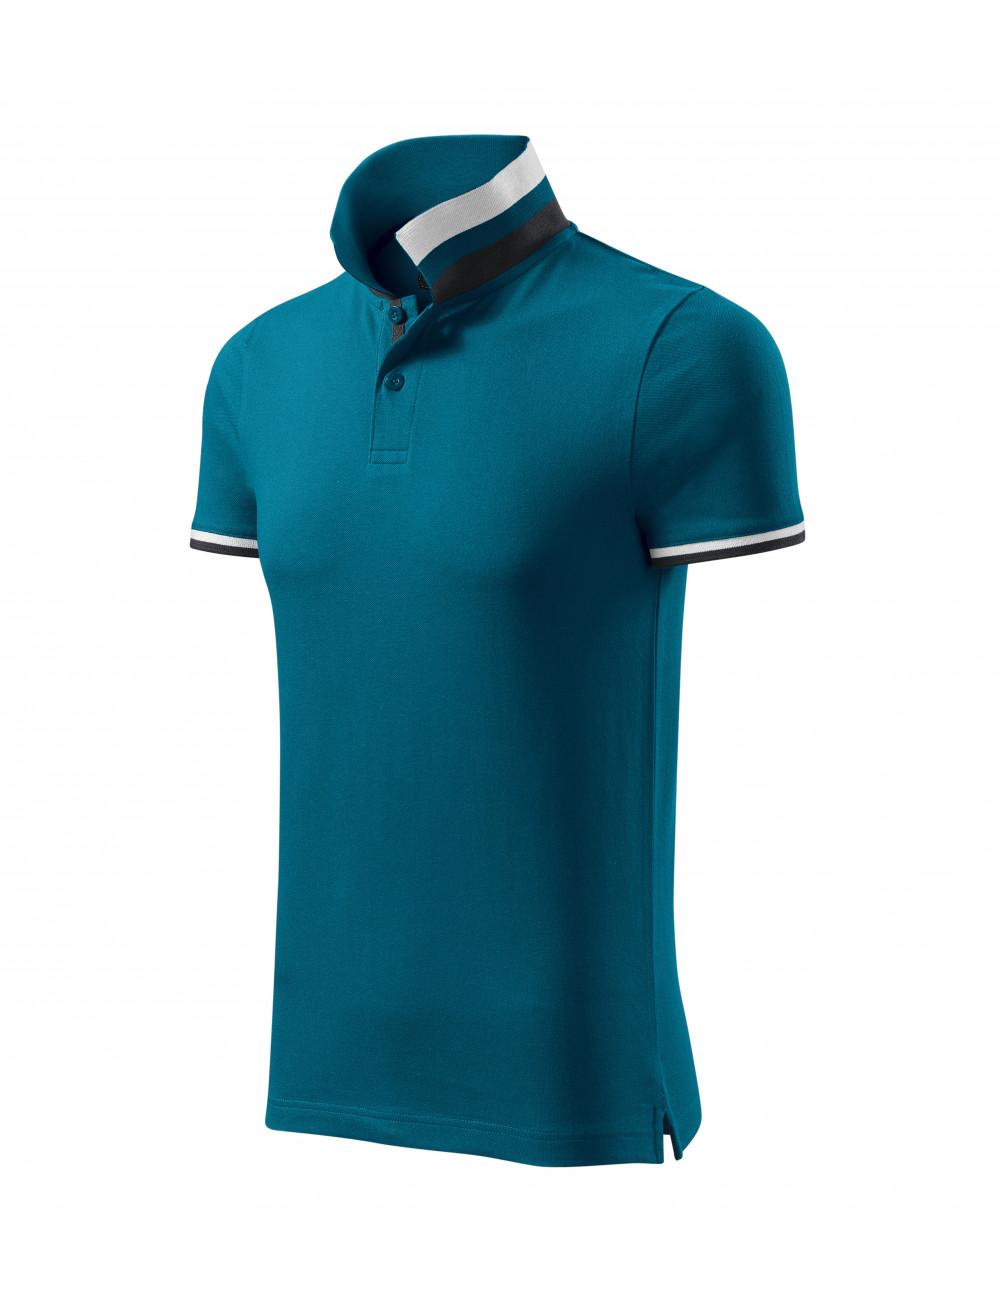 Adler MALFINIPREMIUM Koszulka polo męska Collar Up 256 petrol blue